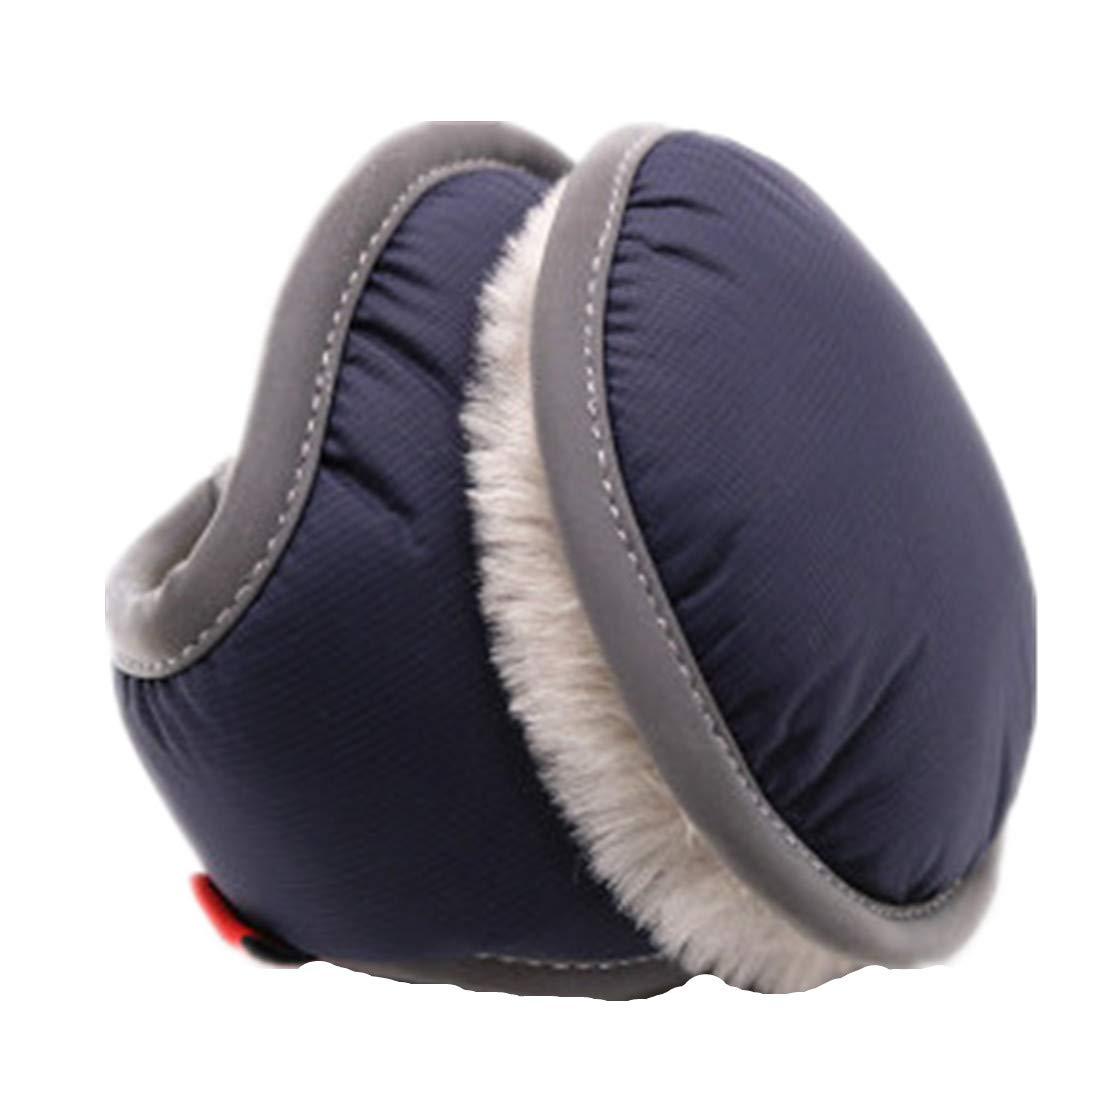 Unisex Collapsible Earmuff Winter Wrap Band Warmer Grip Earlap